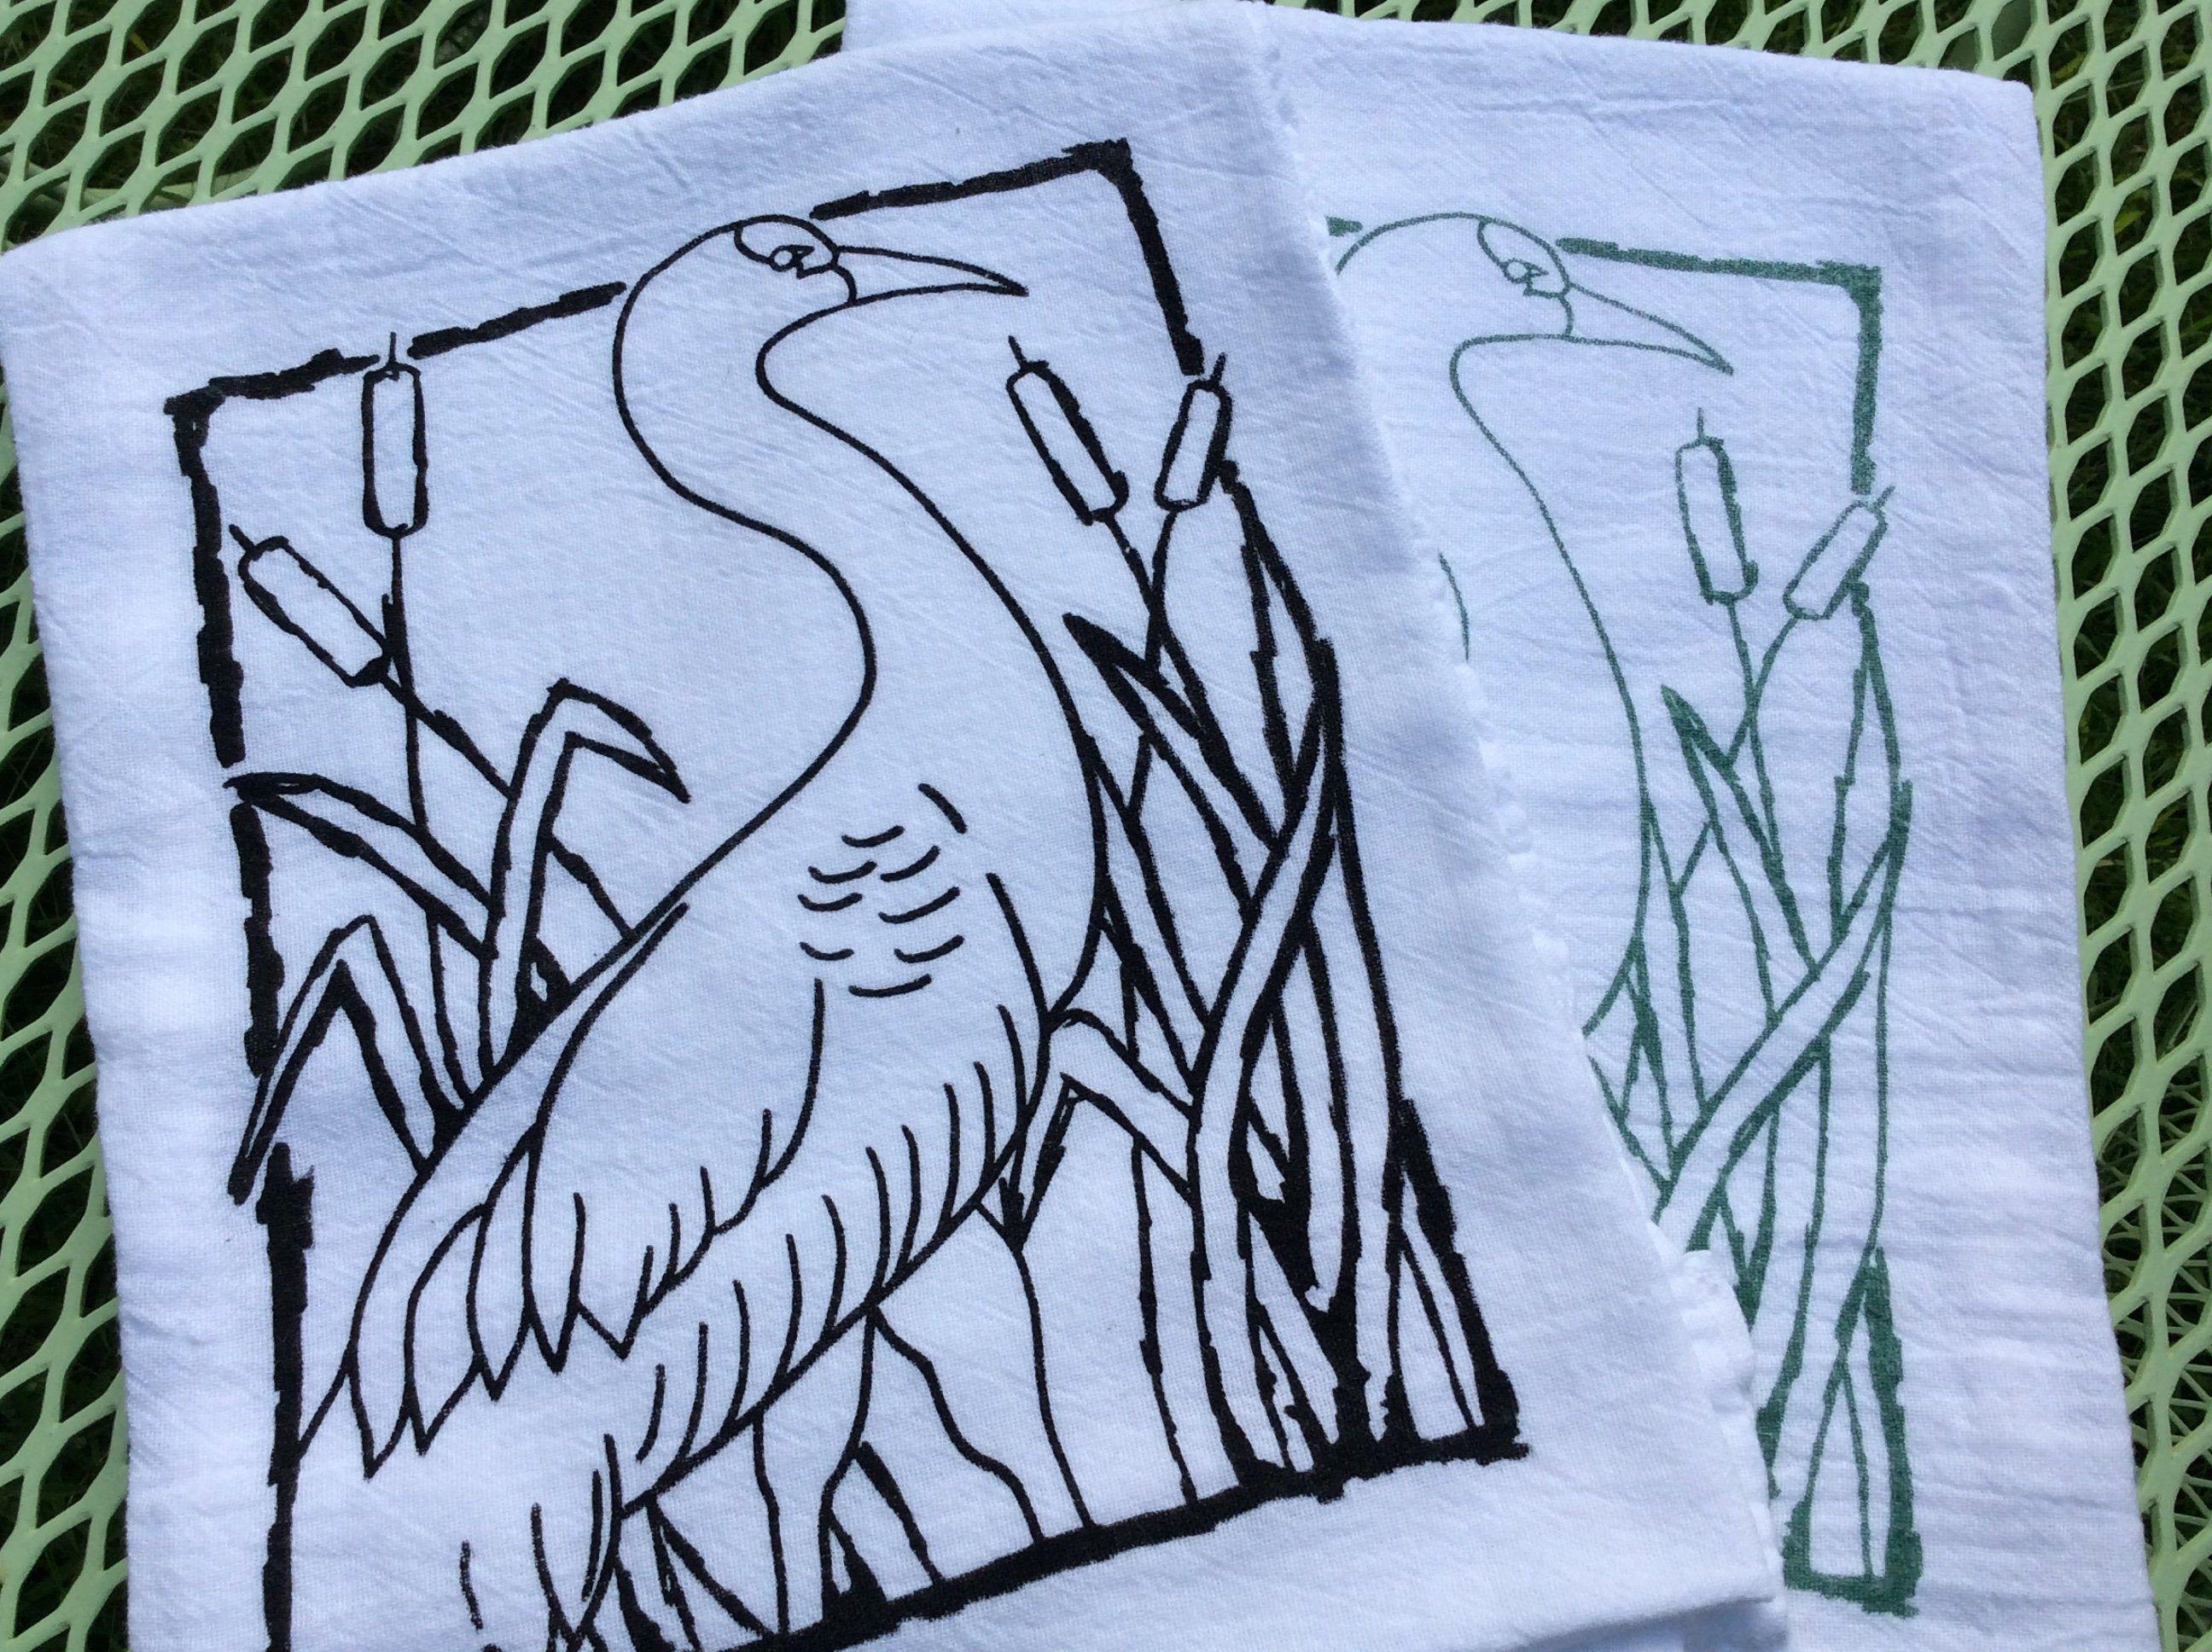 Sandhill Crane Kitchen Dish Towel - Screen Printed - Cotton Flour Sack Towel - Hand Tea Towel - Animal Towels - Flour Sack Dish Towel - Gift #dishtowels